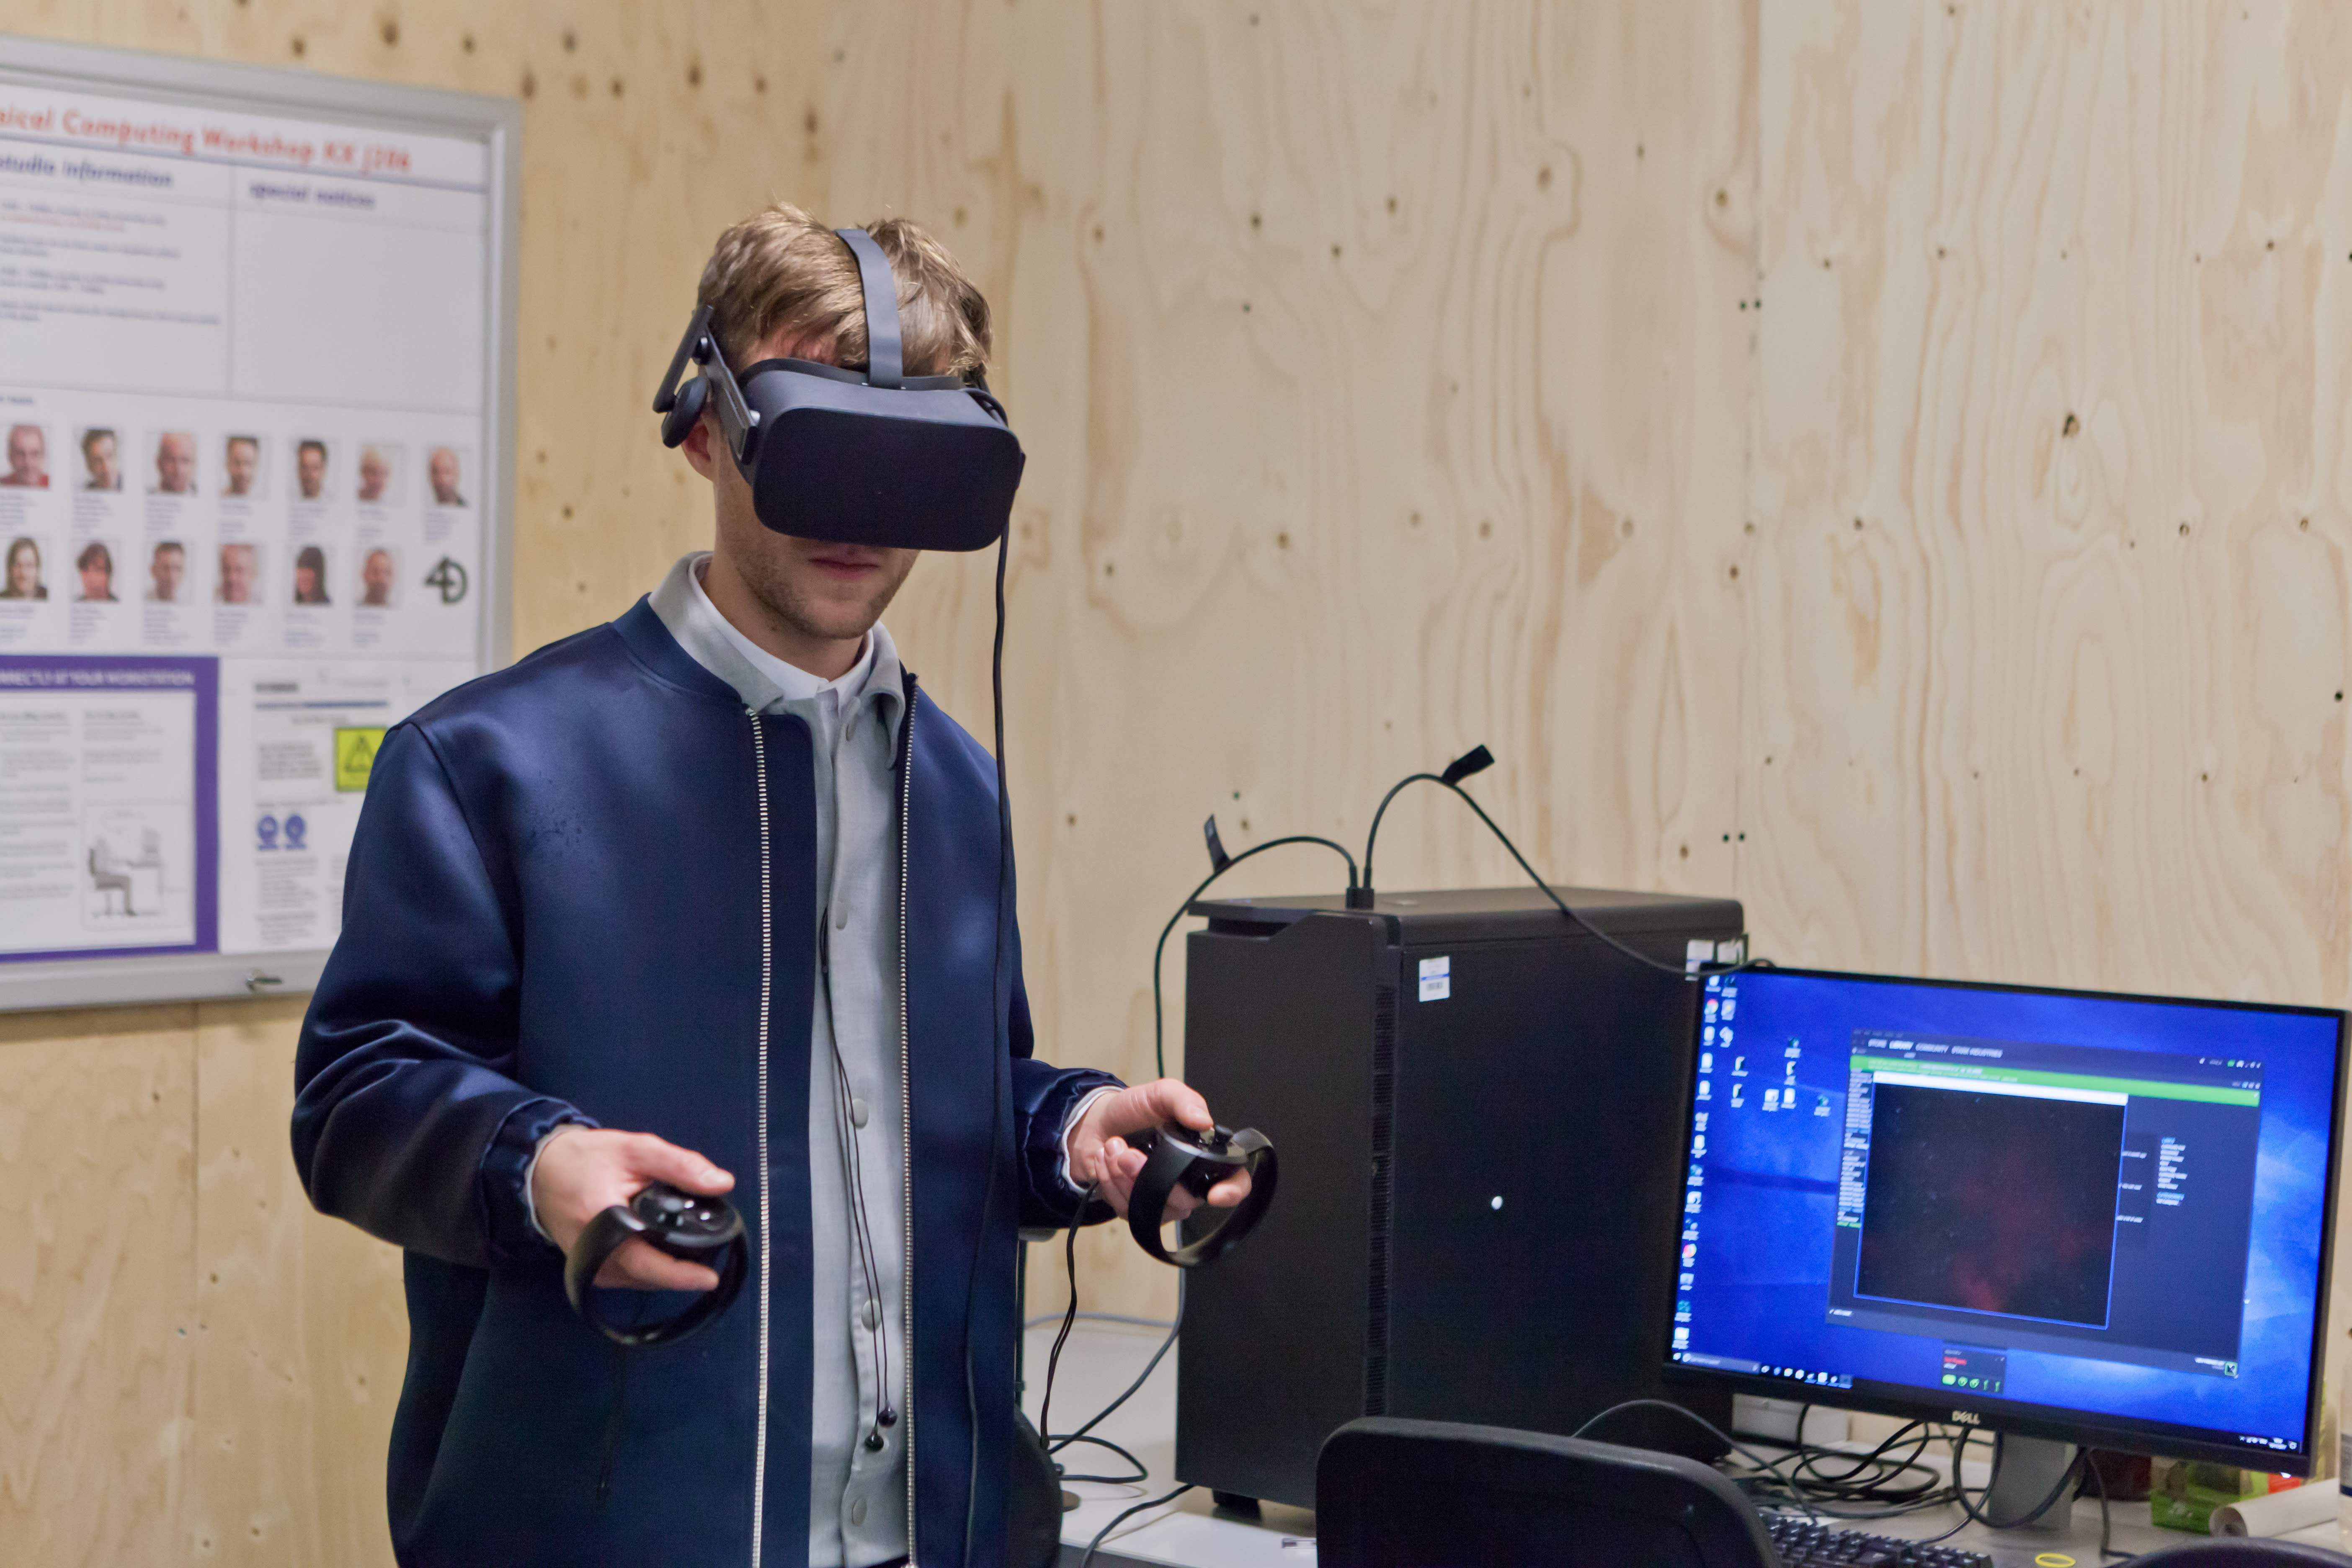 MA-ACE-Virtual-Reality-Conference-01.jpg